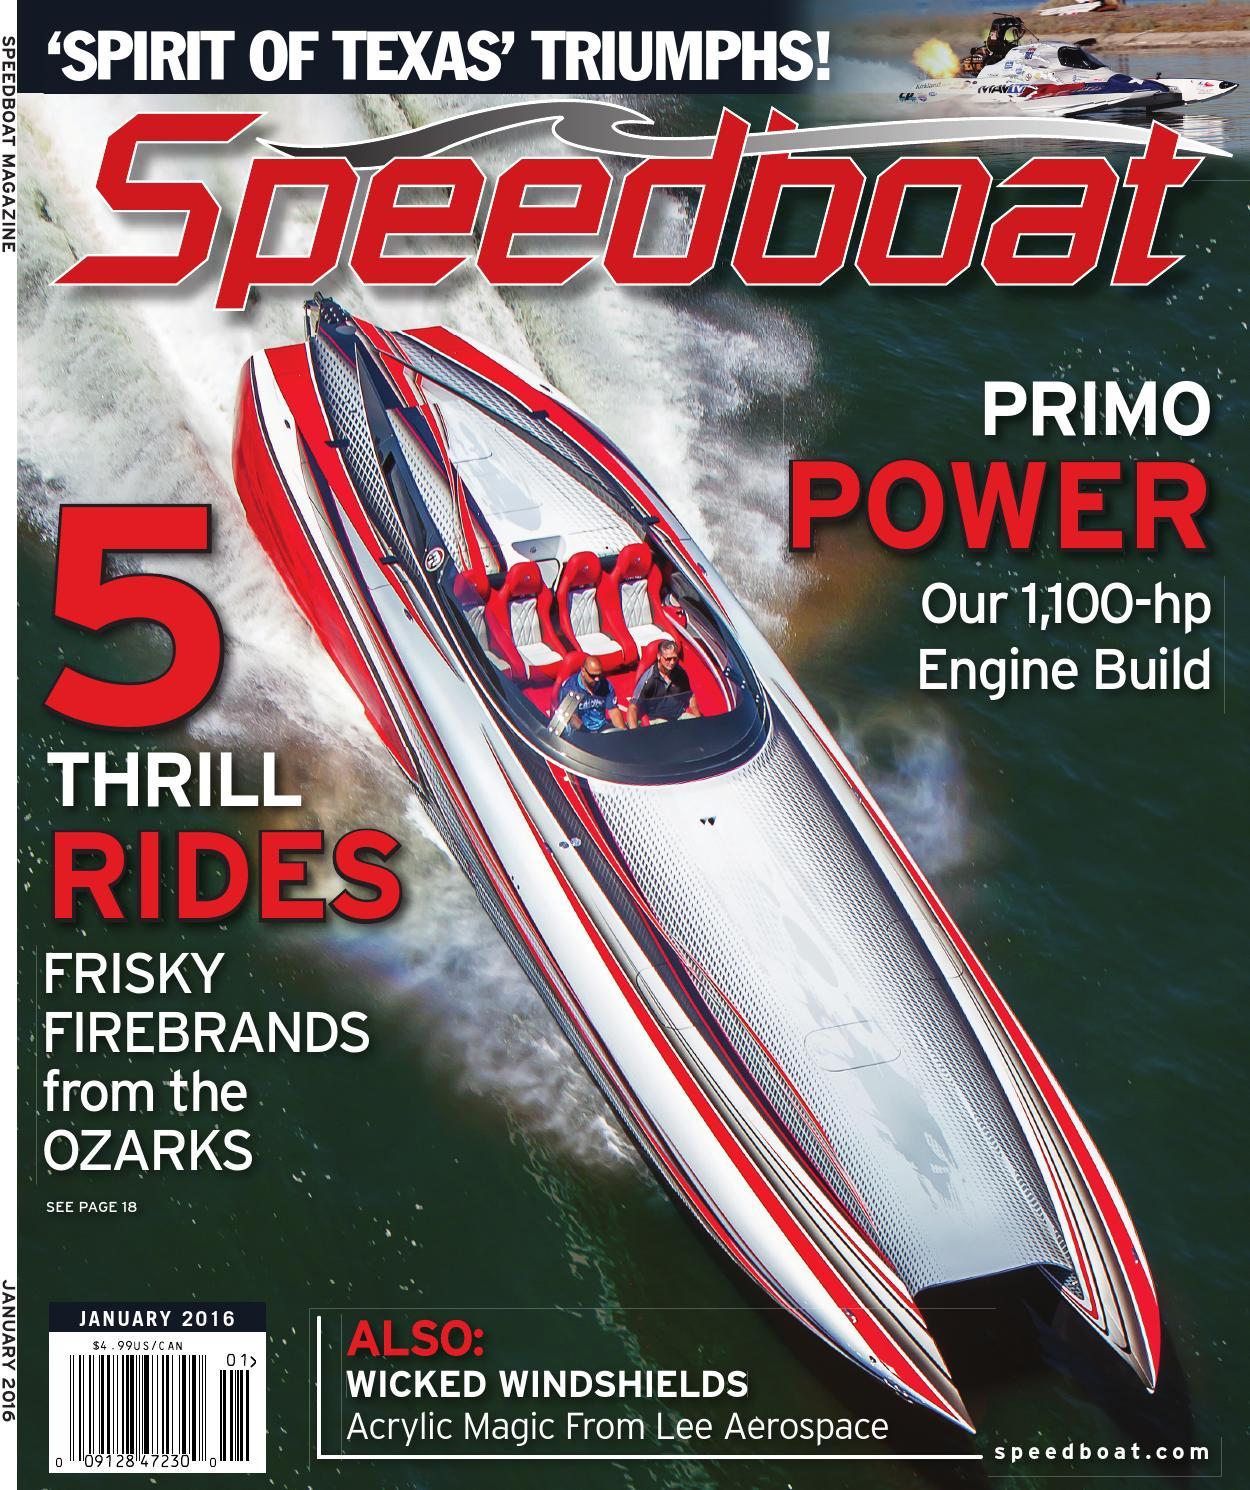 speedboat online january 2016 by brett bayne issuu